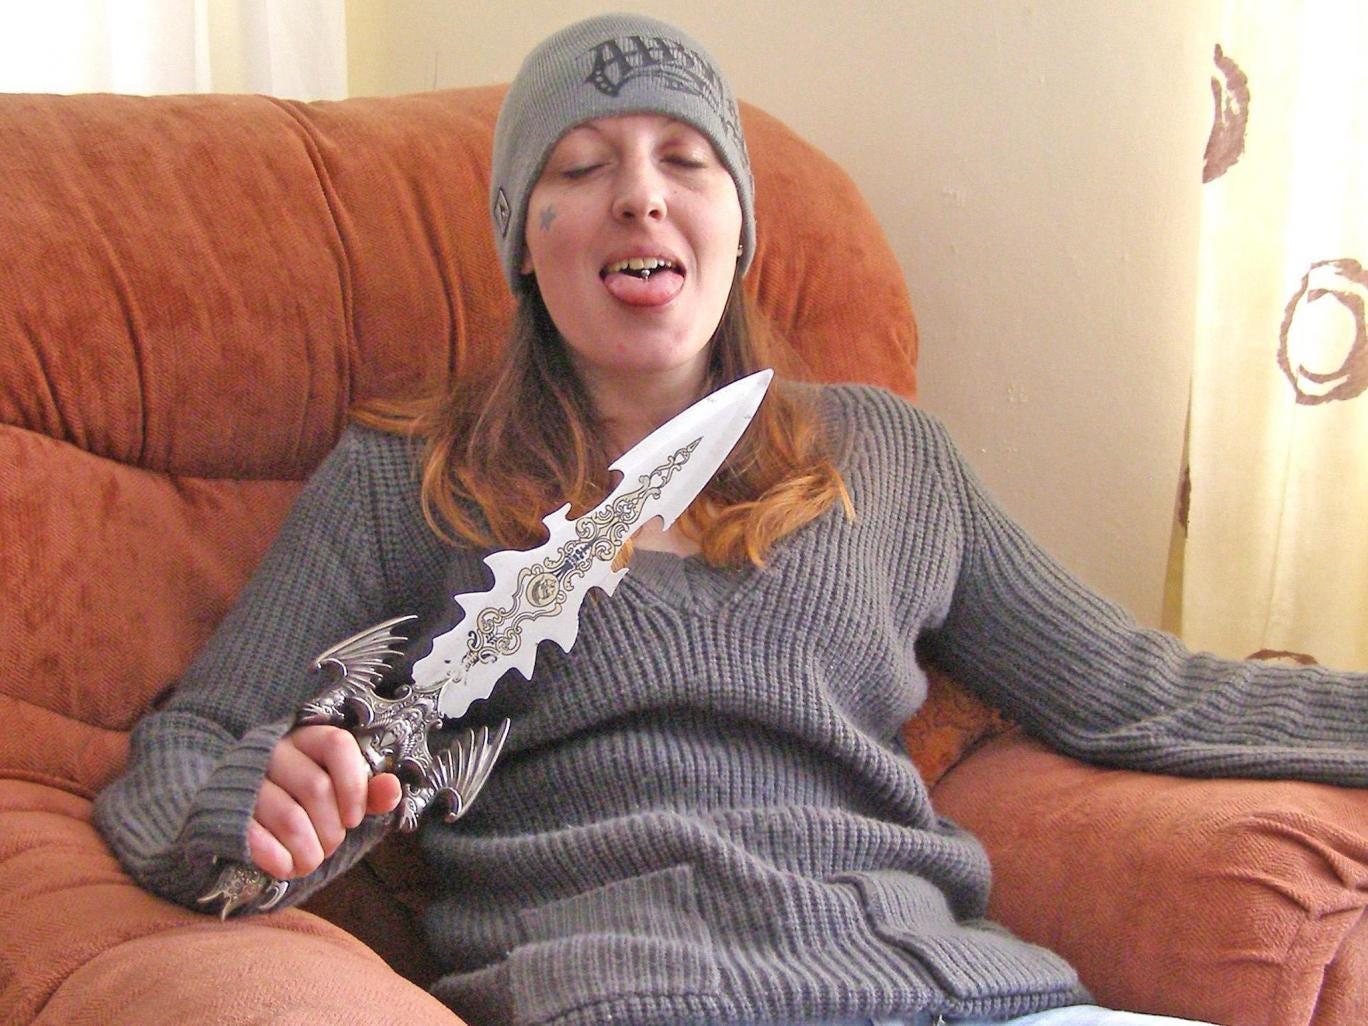 Joanna Dennehy posing shortly after a murder